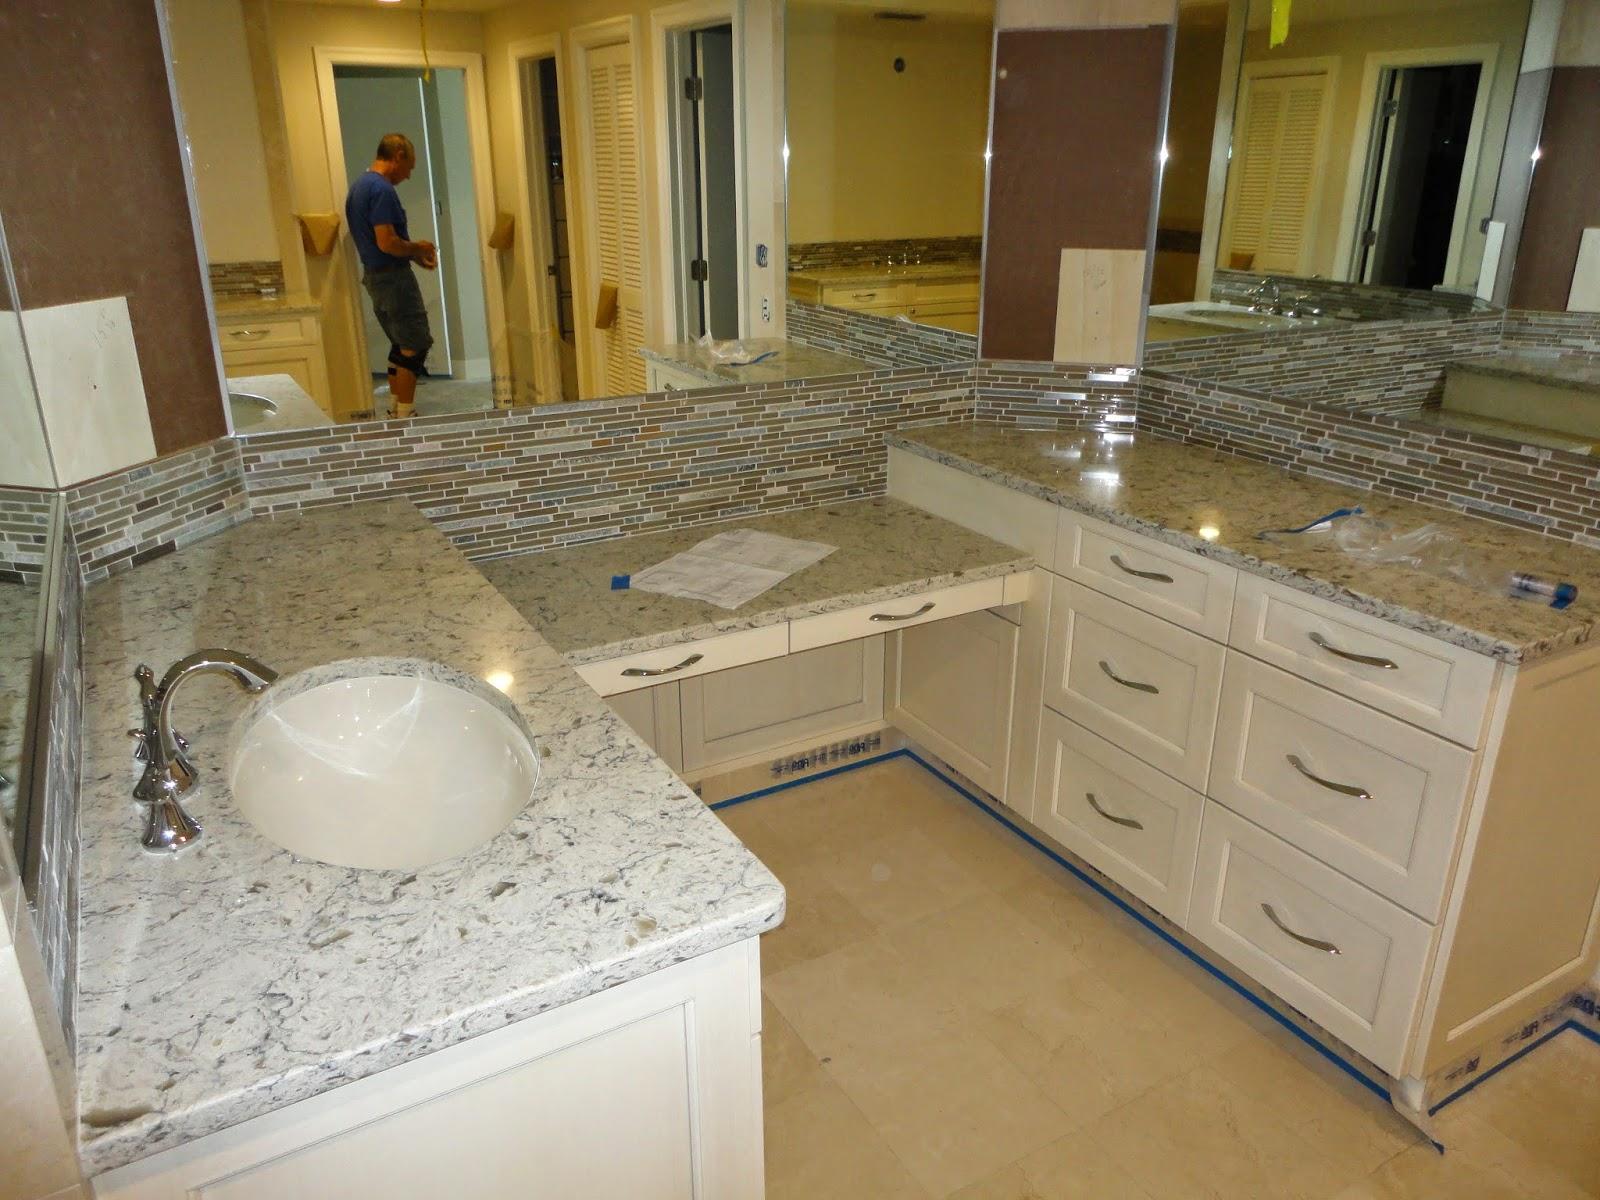 Tile Sarasota Sarasota Tile Contractor Installed This Crema Marfil - 12x12 tile shower walls